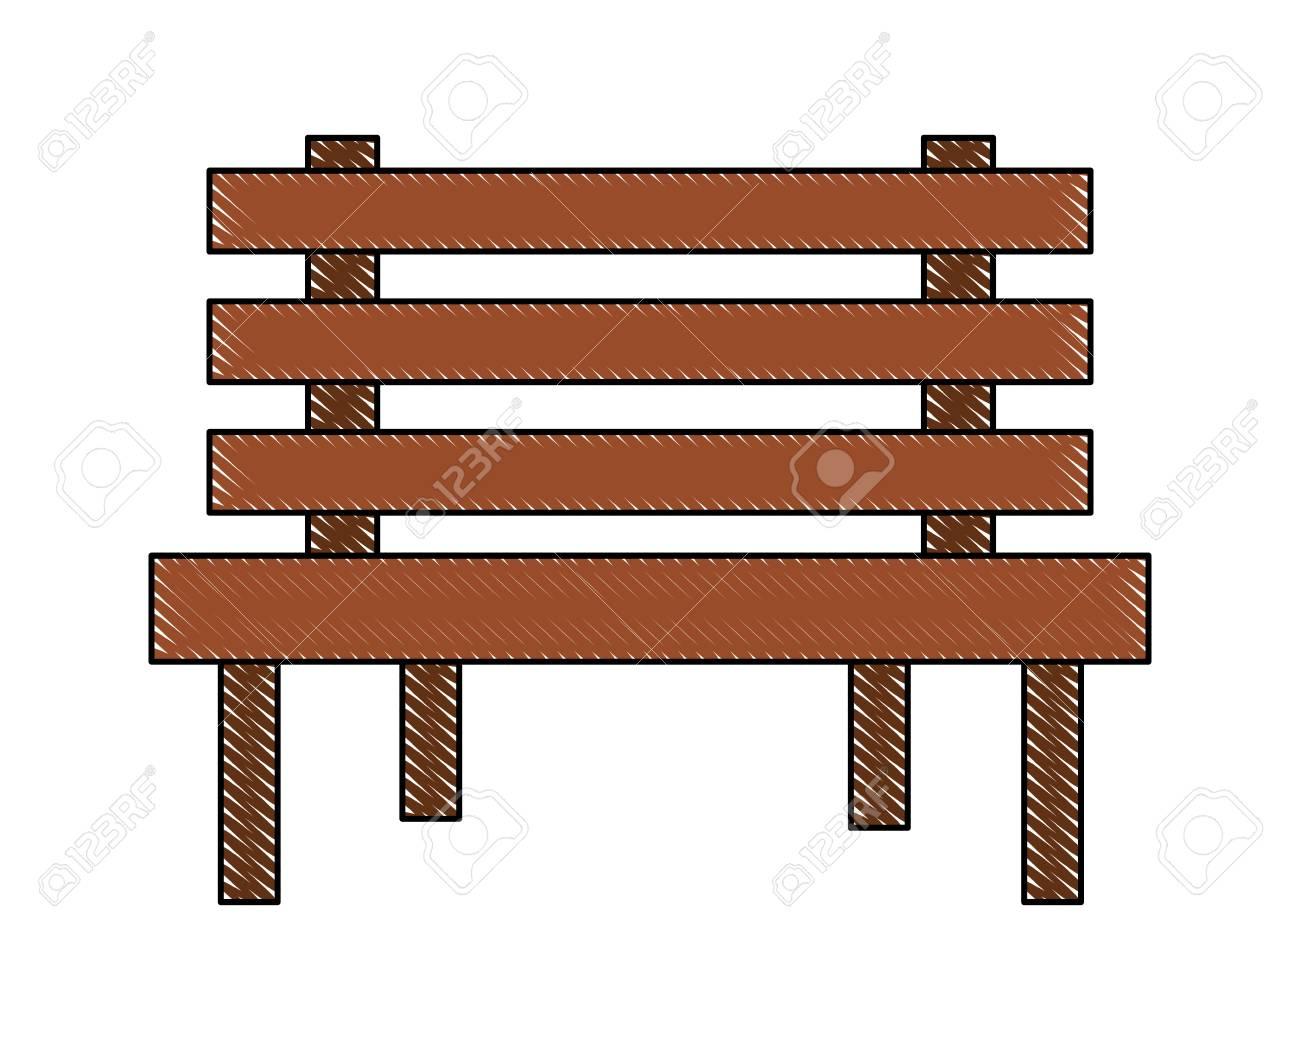 Wooden Bench Rustic Furniture Icon Vector Illustration Lizenzfrei